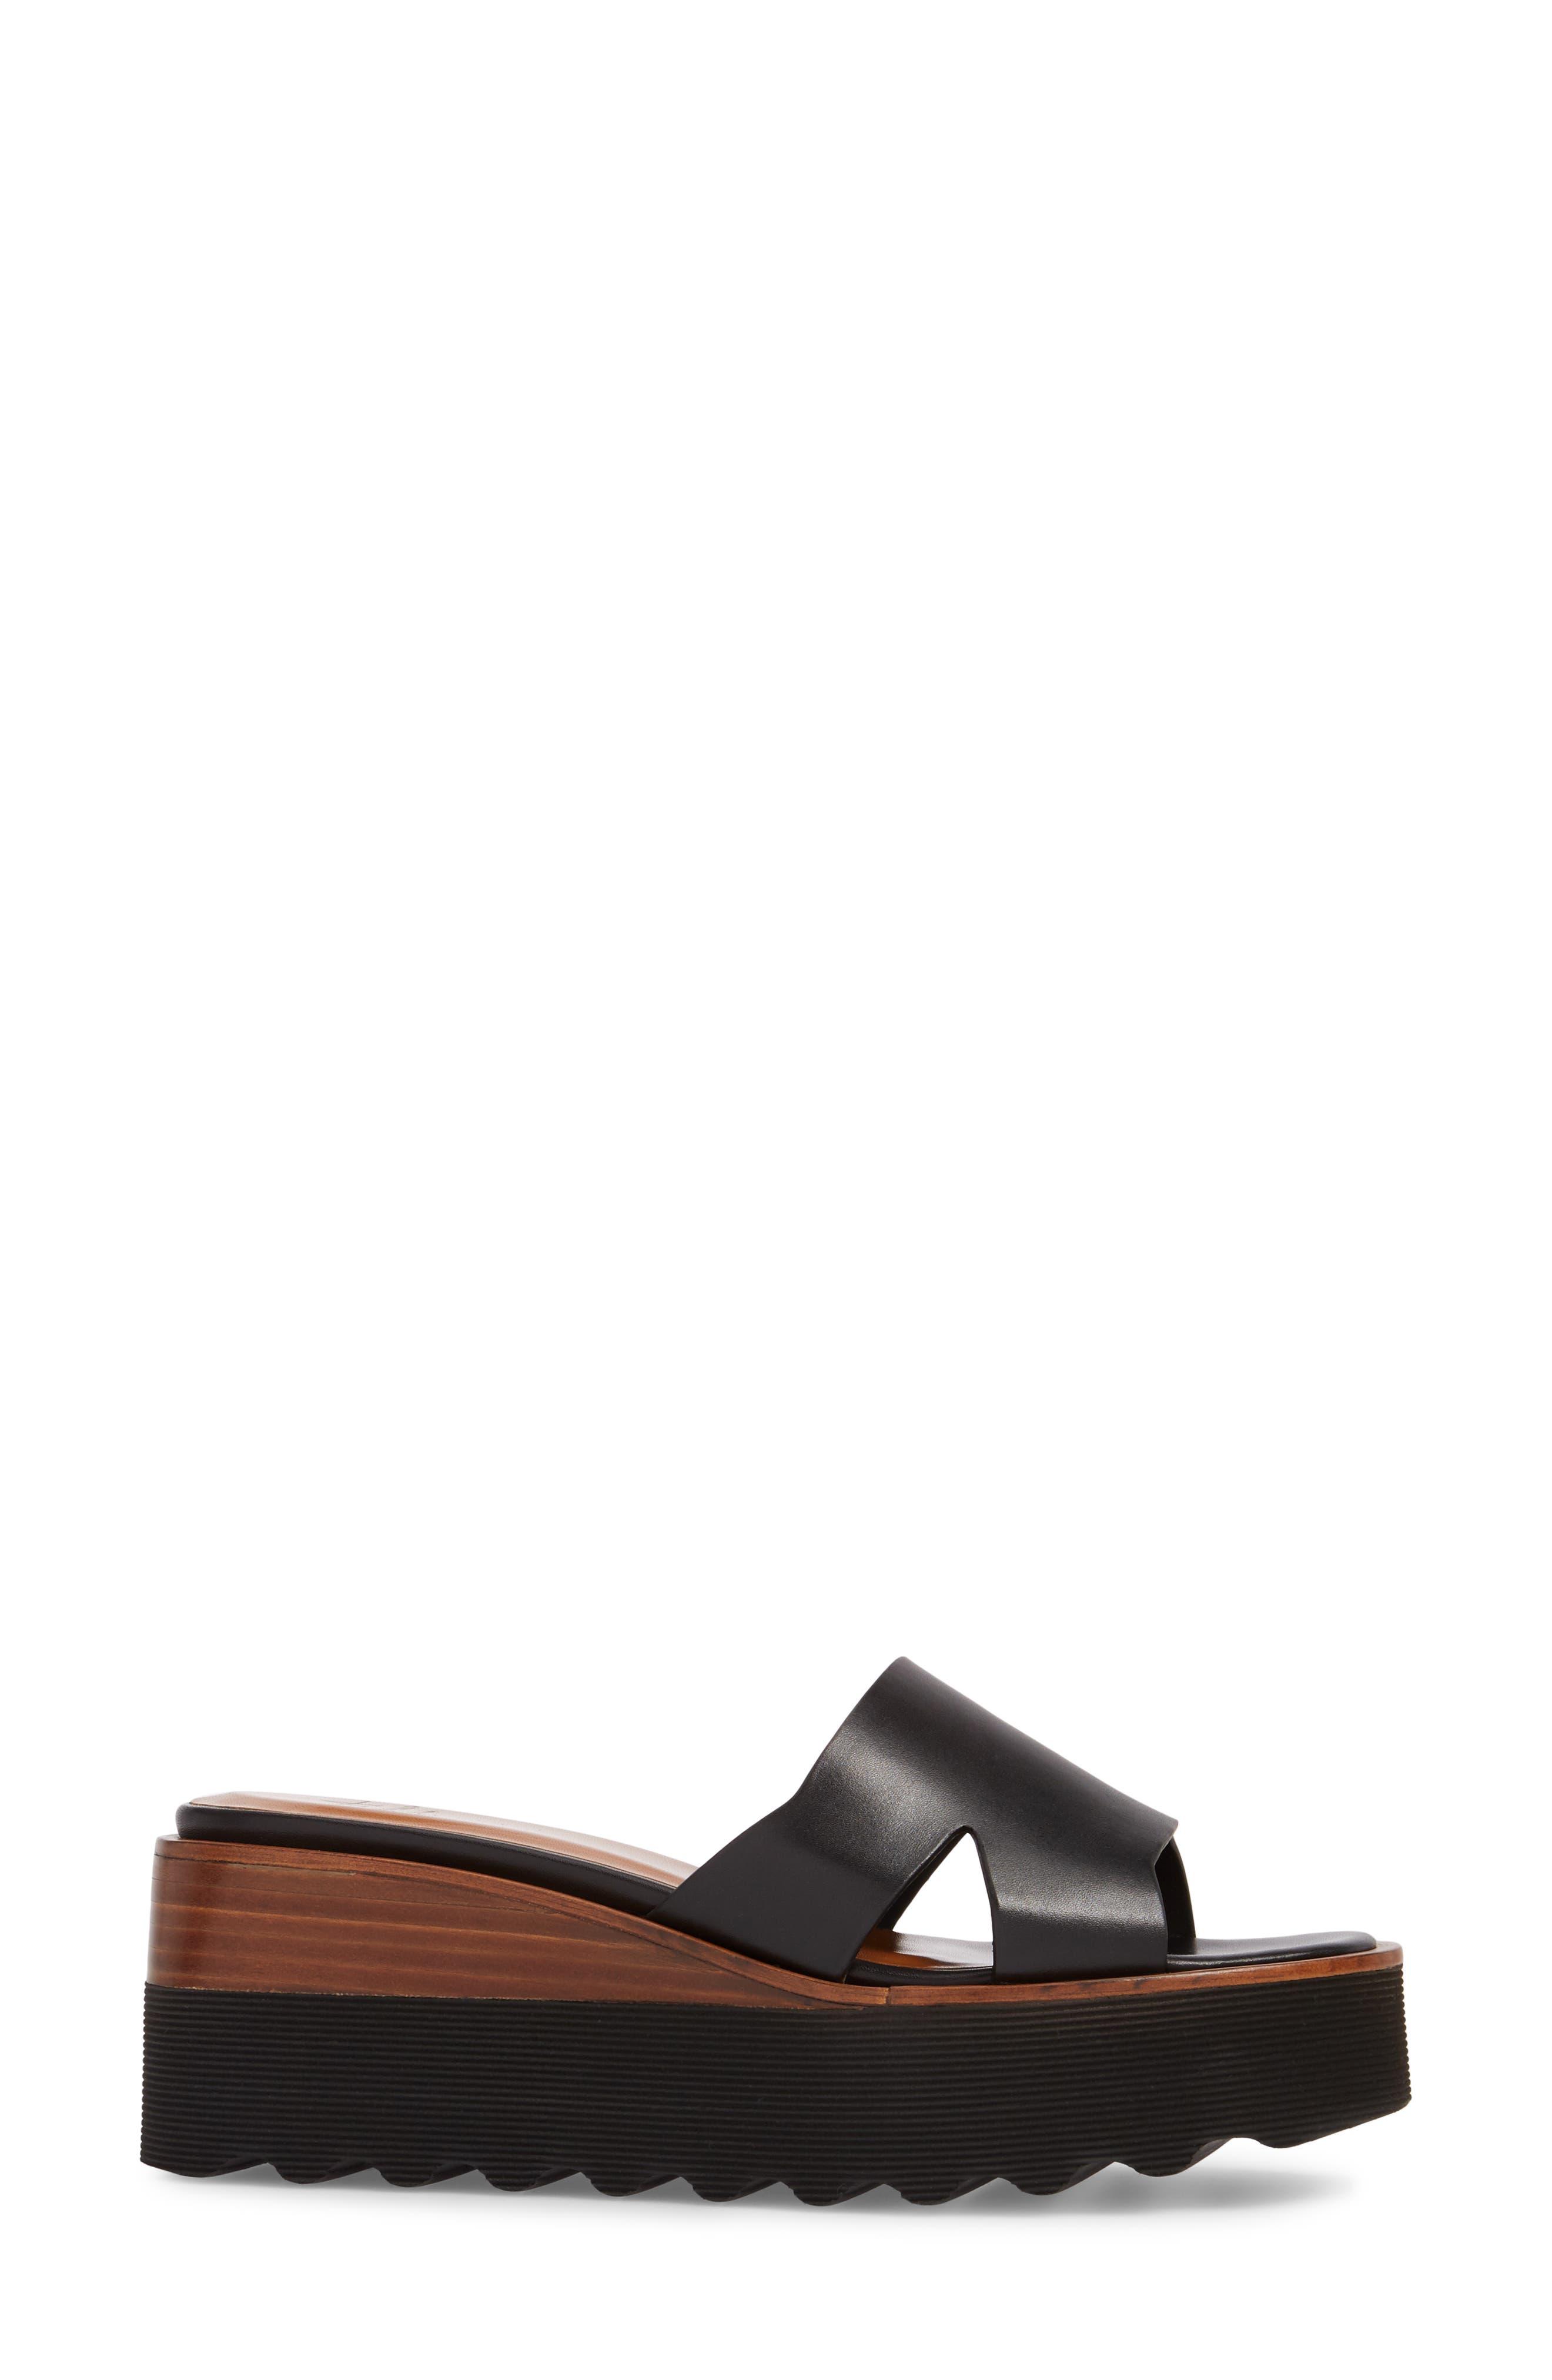 Tayla Platform Wedge Sandal,                             Alternate thumbnail 3, color,                             001